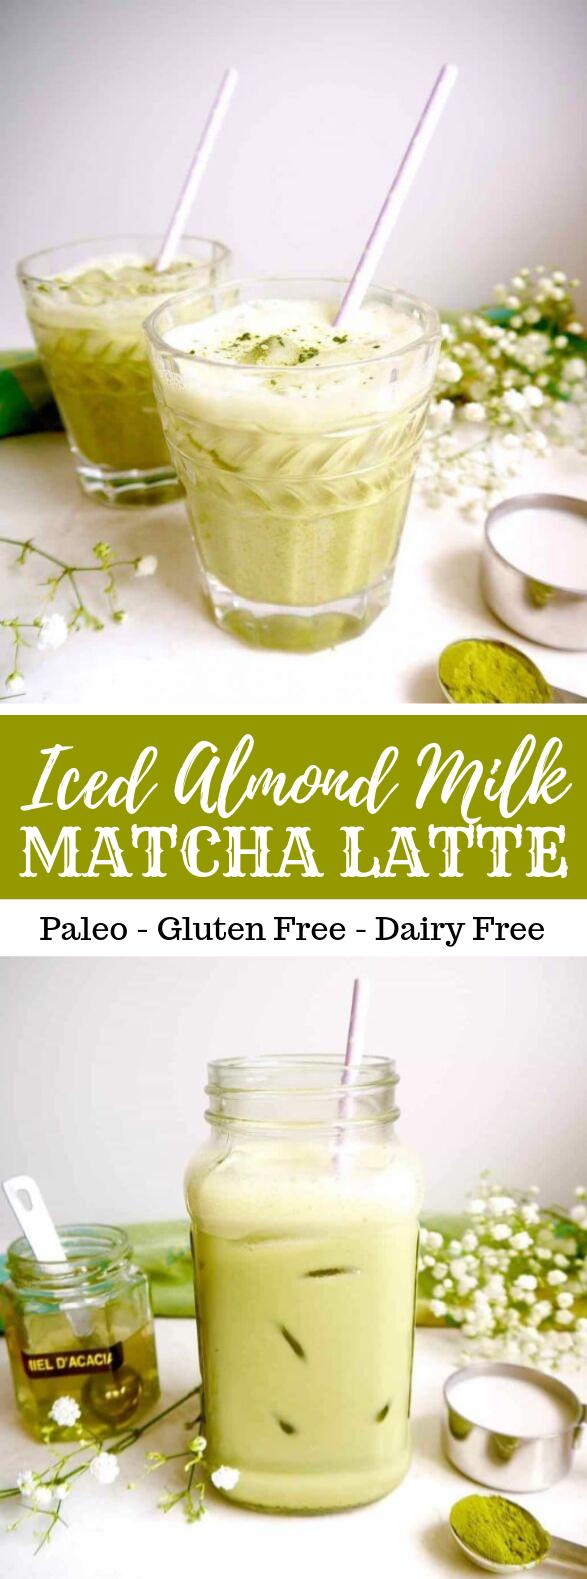 Iced Almond Milk Matcha Latte (Paleo, GF) #drinks #dairyfree